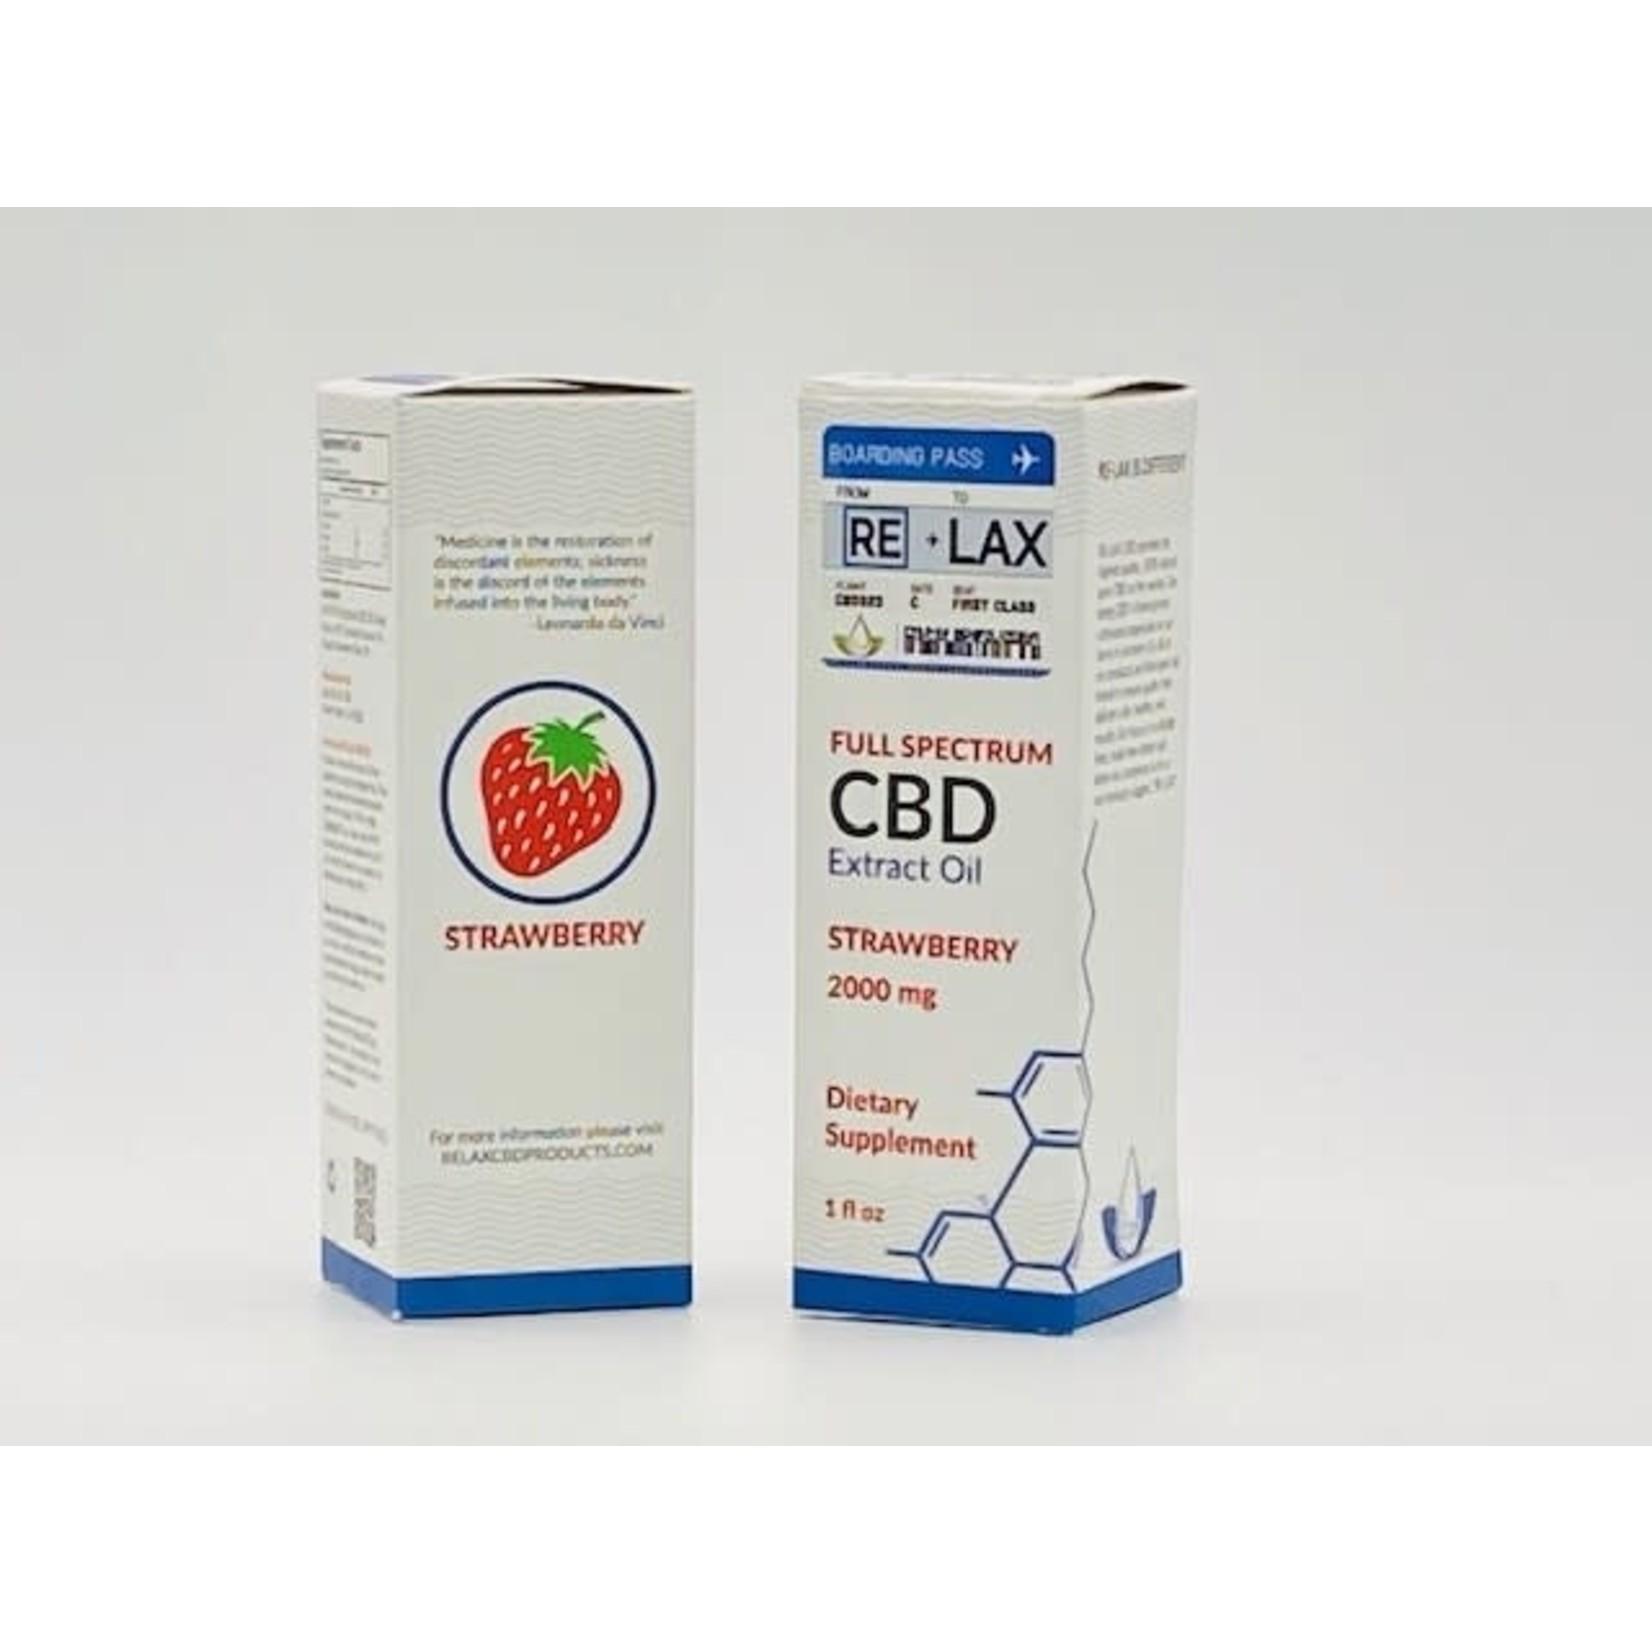 RE-LAX CBD RLX CBD Strawberry Tincture